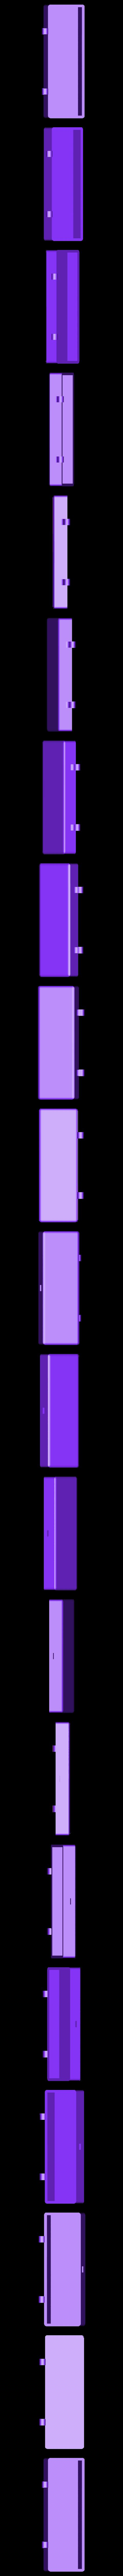 boite pour autoradio bas.stl Download STL file car radio pouch (box, kit, etc.) • 3D printable design, YOHAN_3D